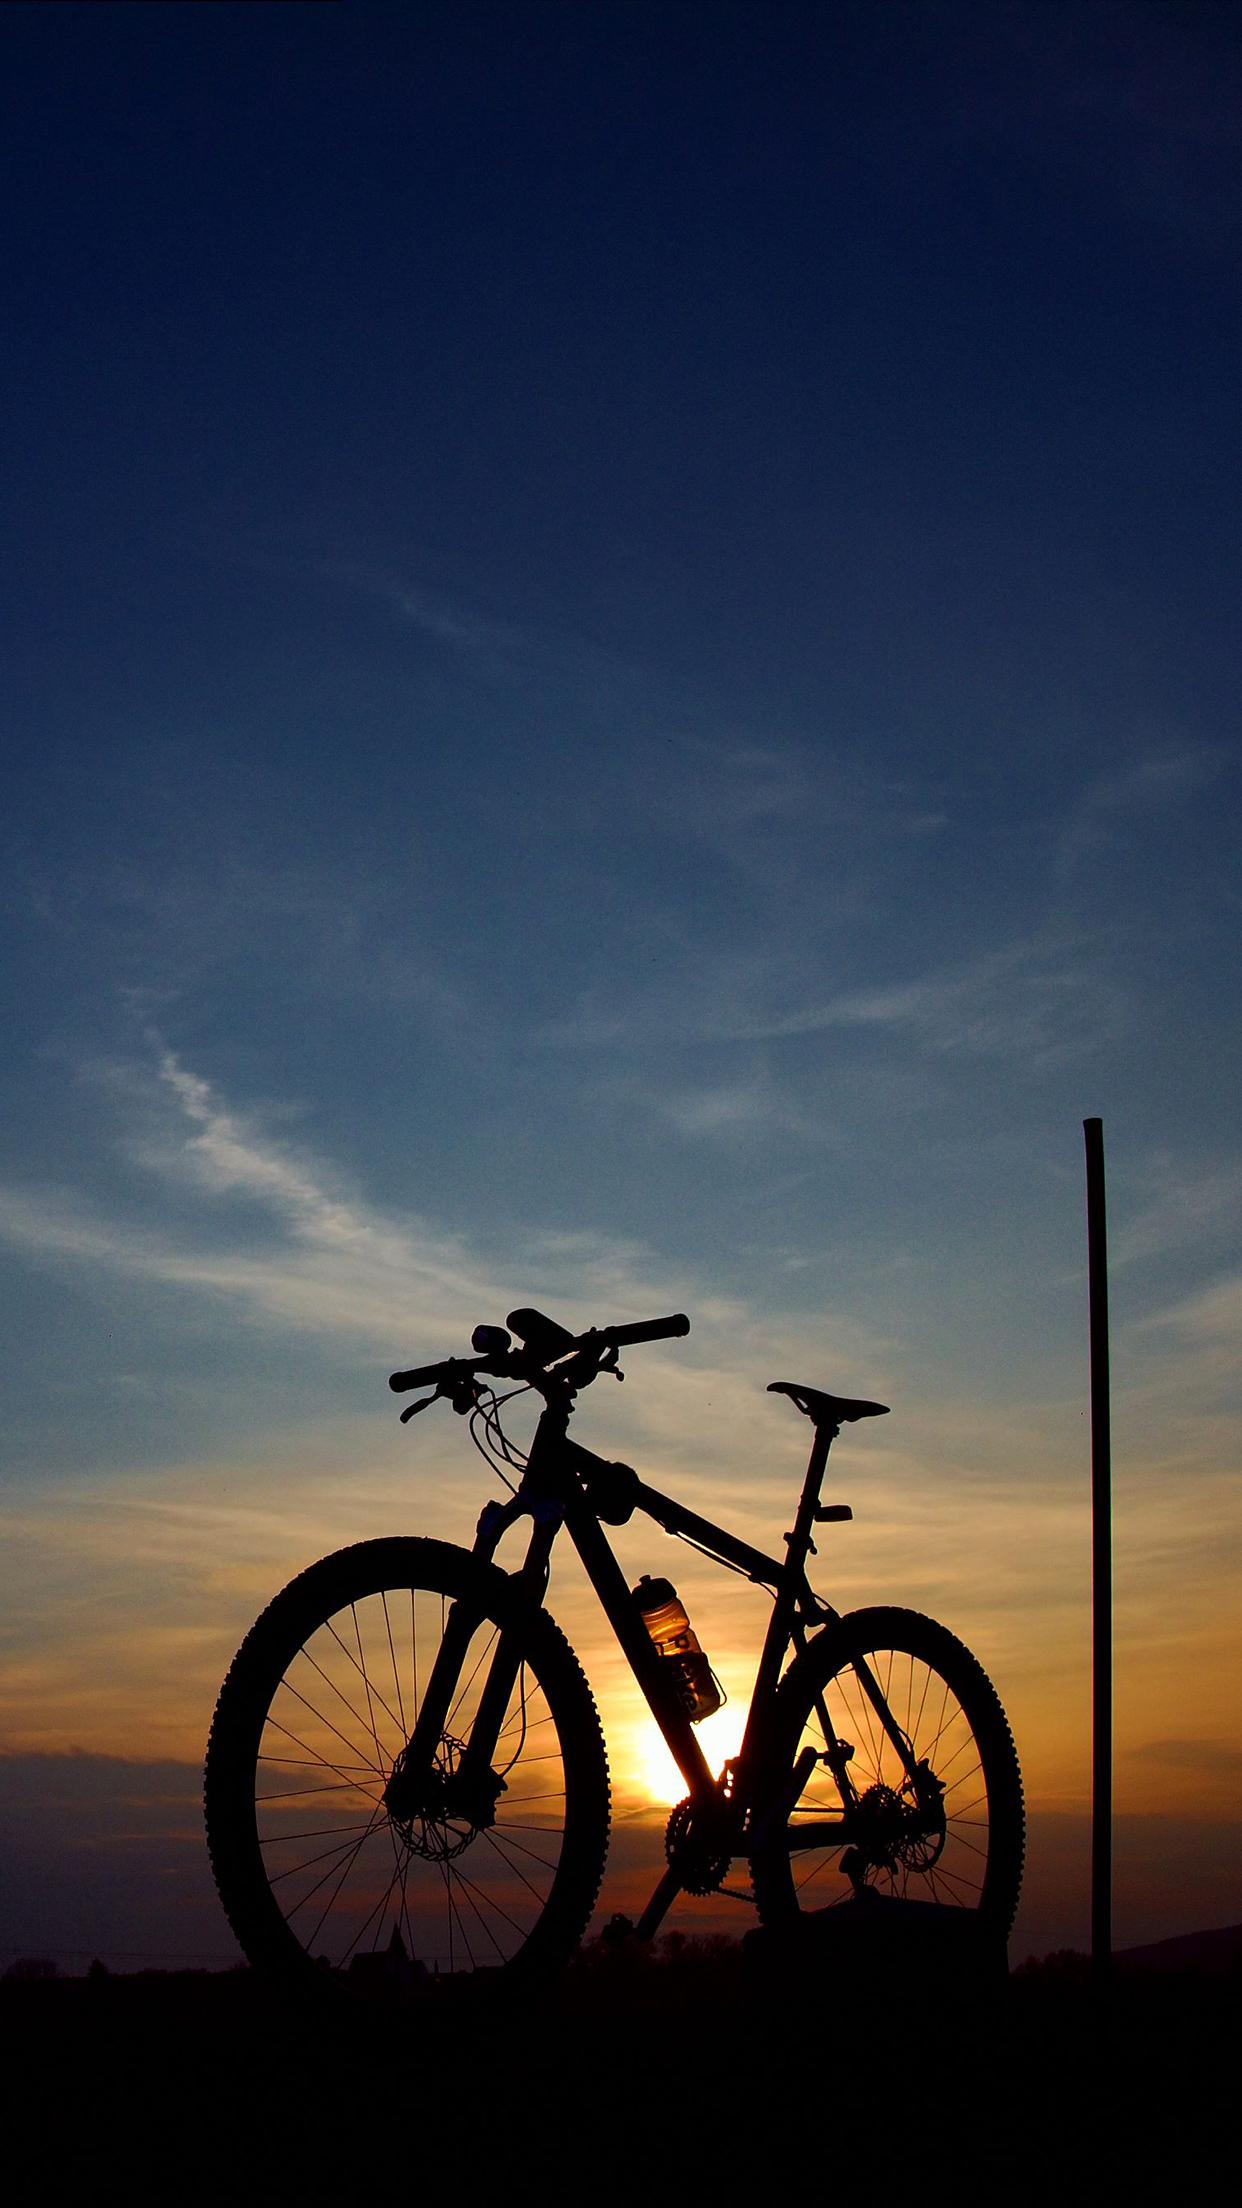 Mountain Bike Wallpaper for iPhone X, 8, 7, 6